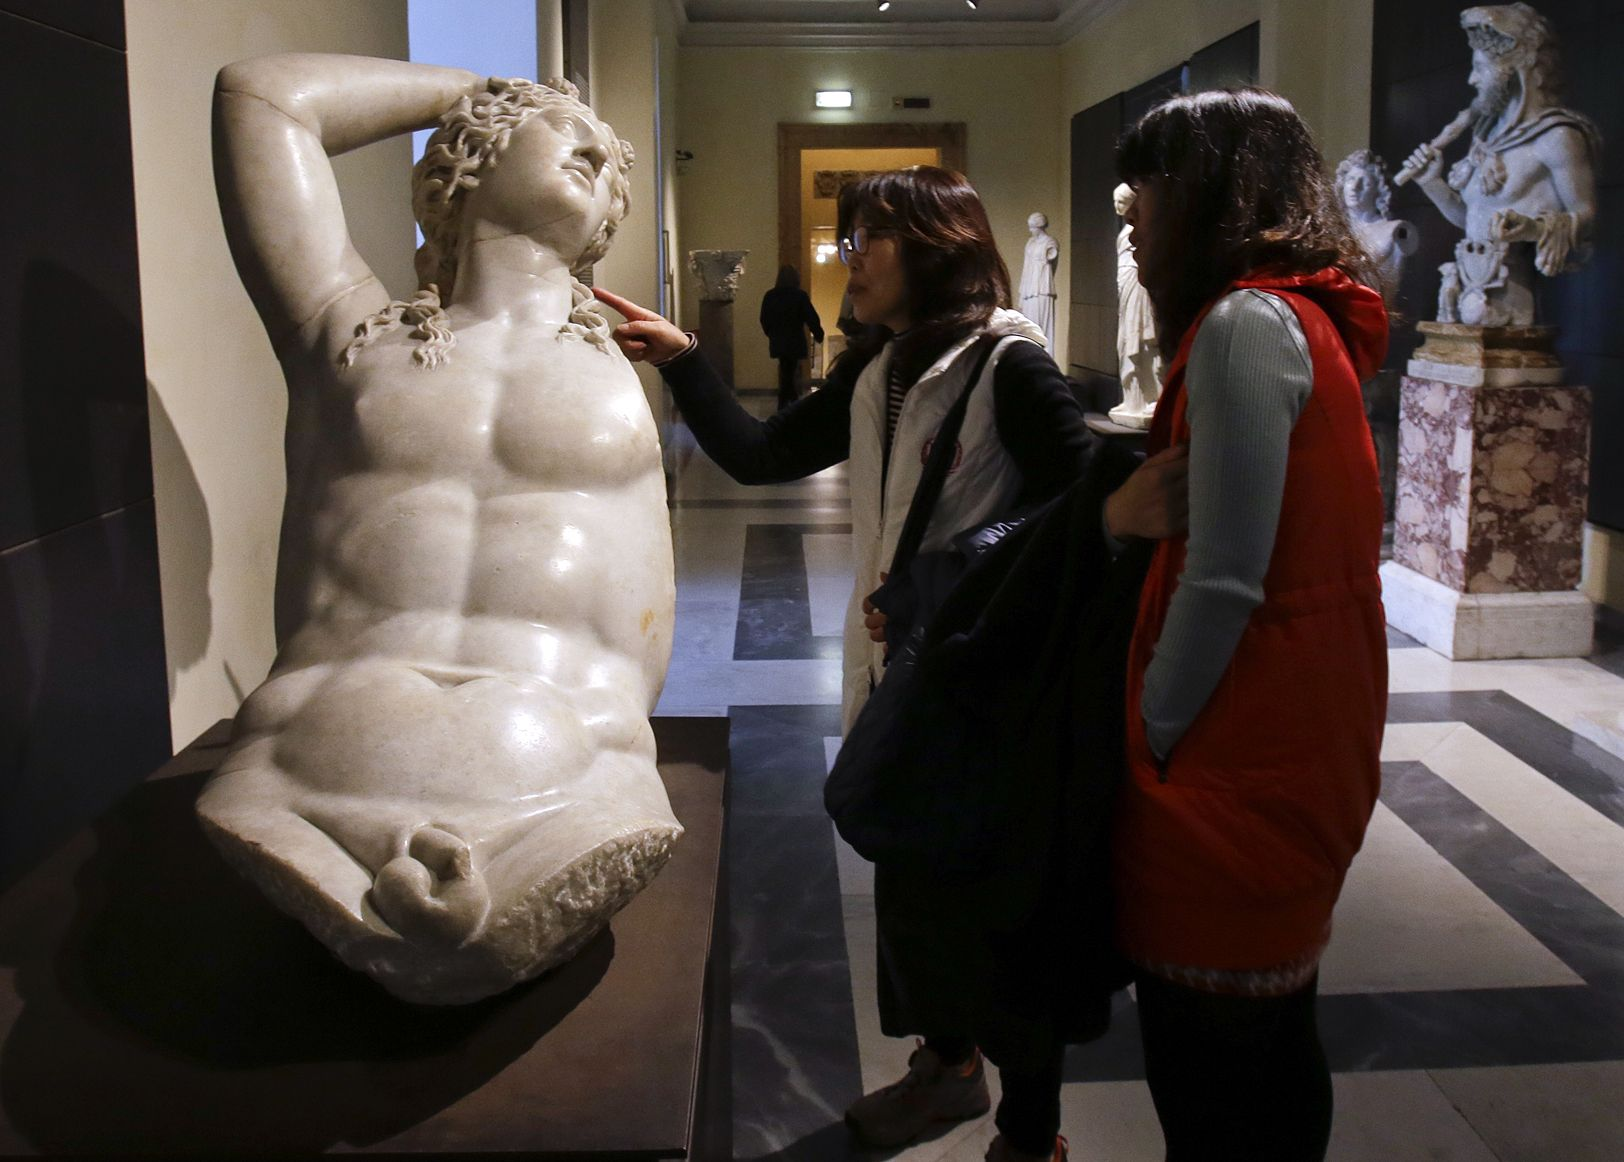 Italia tapa obras desnudas por visita del presidente iraní